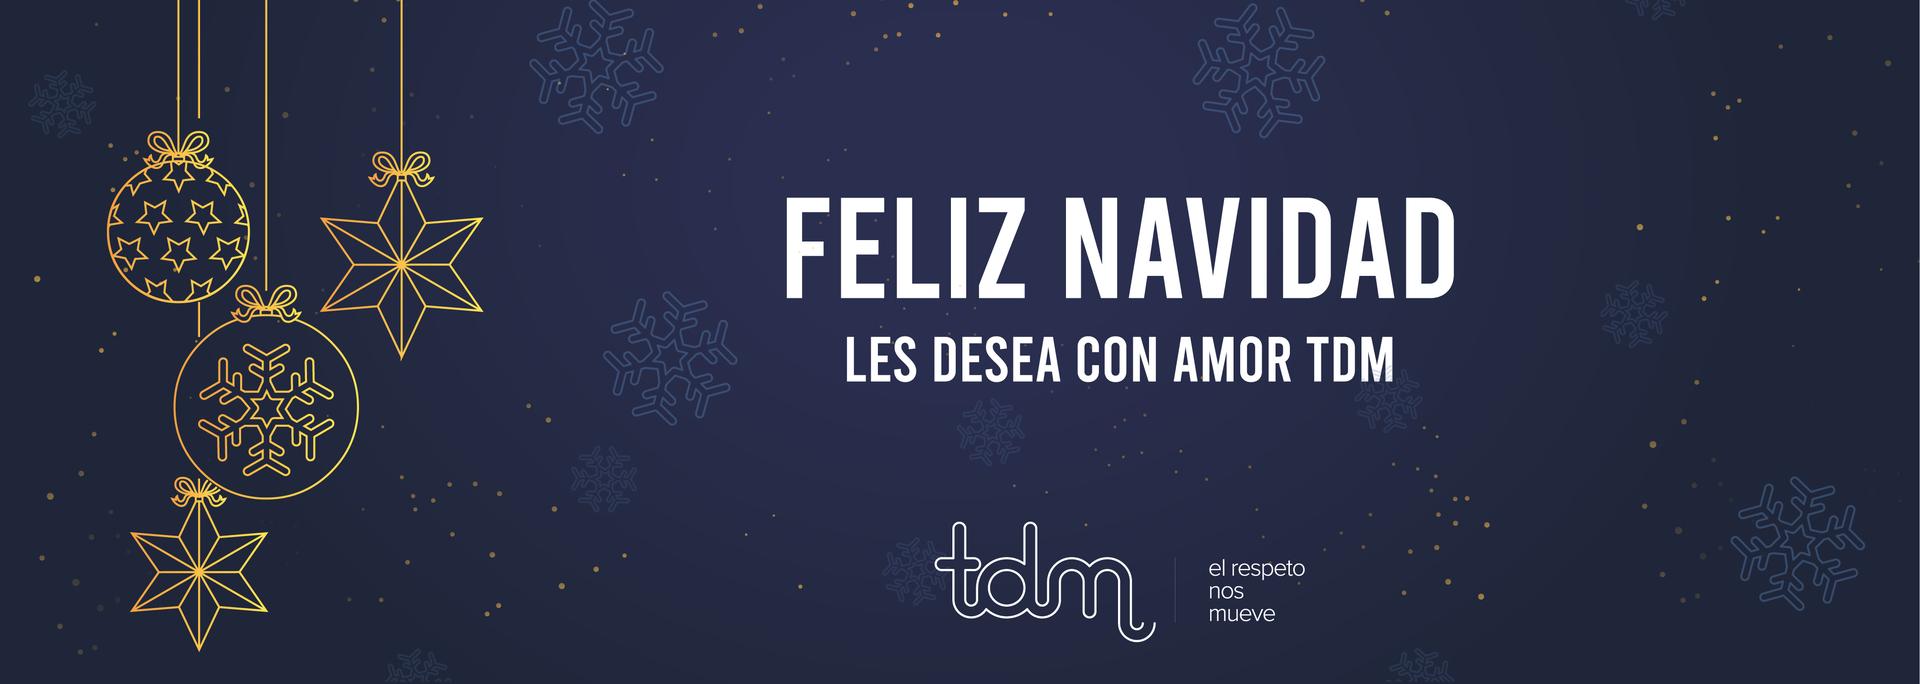 https://www.tdm.com.co/wp-content/uploads/2019/12/banner4navidad-01.jpg